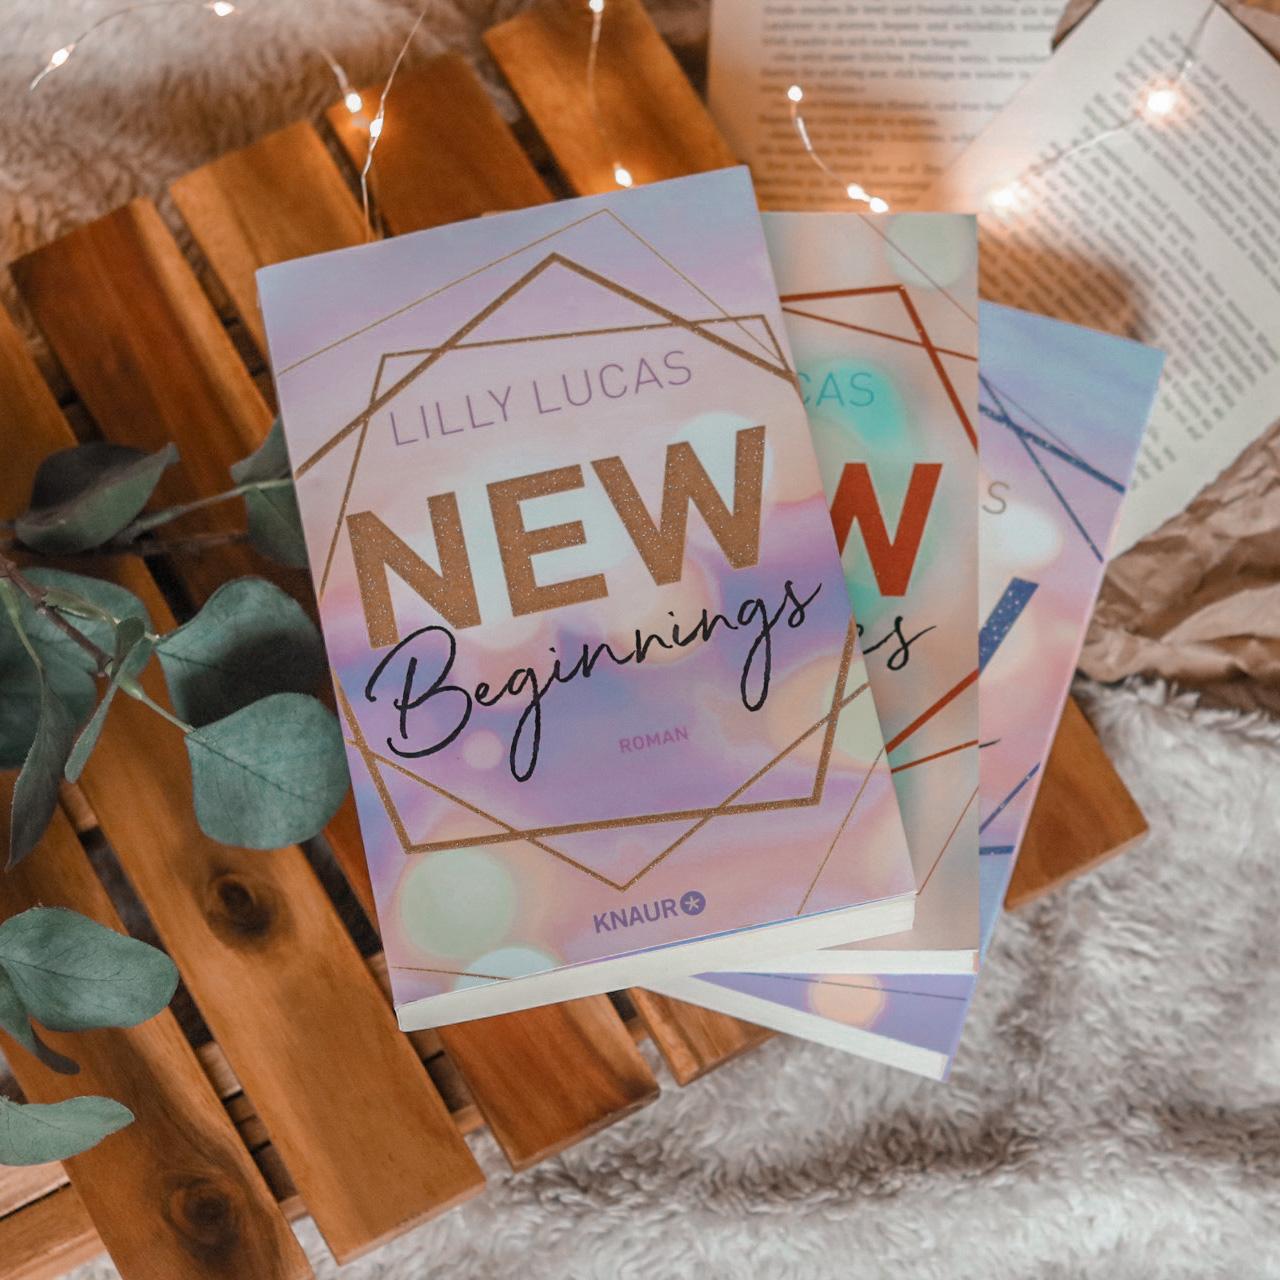 New Beginnings – Green Valley #1 | Lilly Lucas